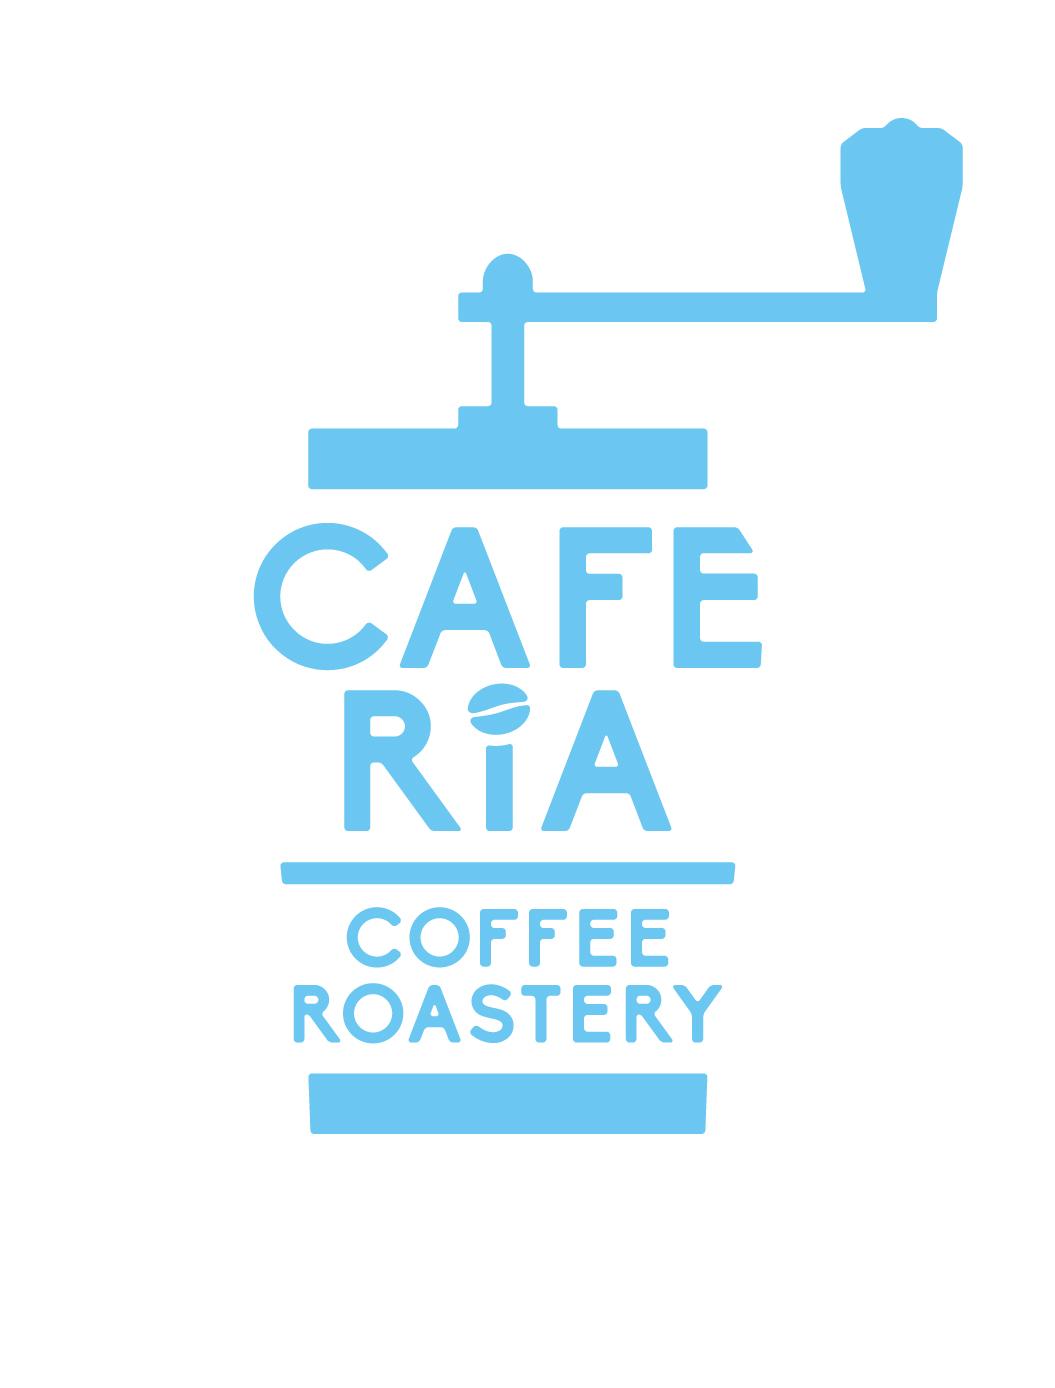 CAFERIA COFFEE ROASTERY